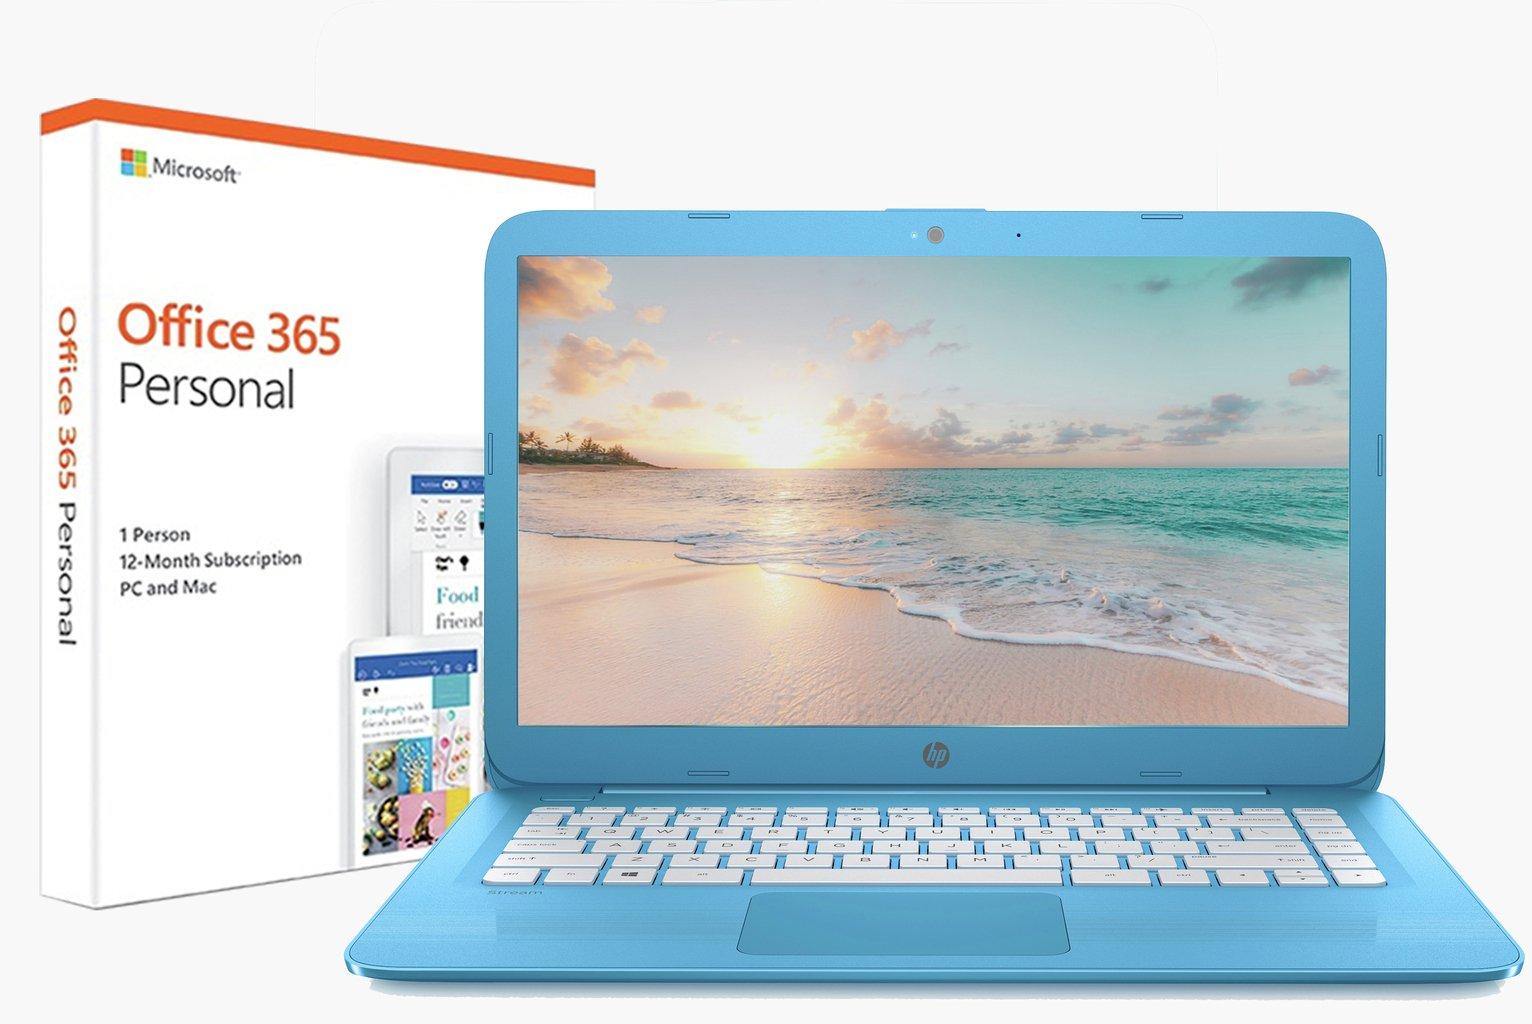 HP Stream 14 Inch Celeron 4GB 32GB Cloudbook - Blue